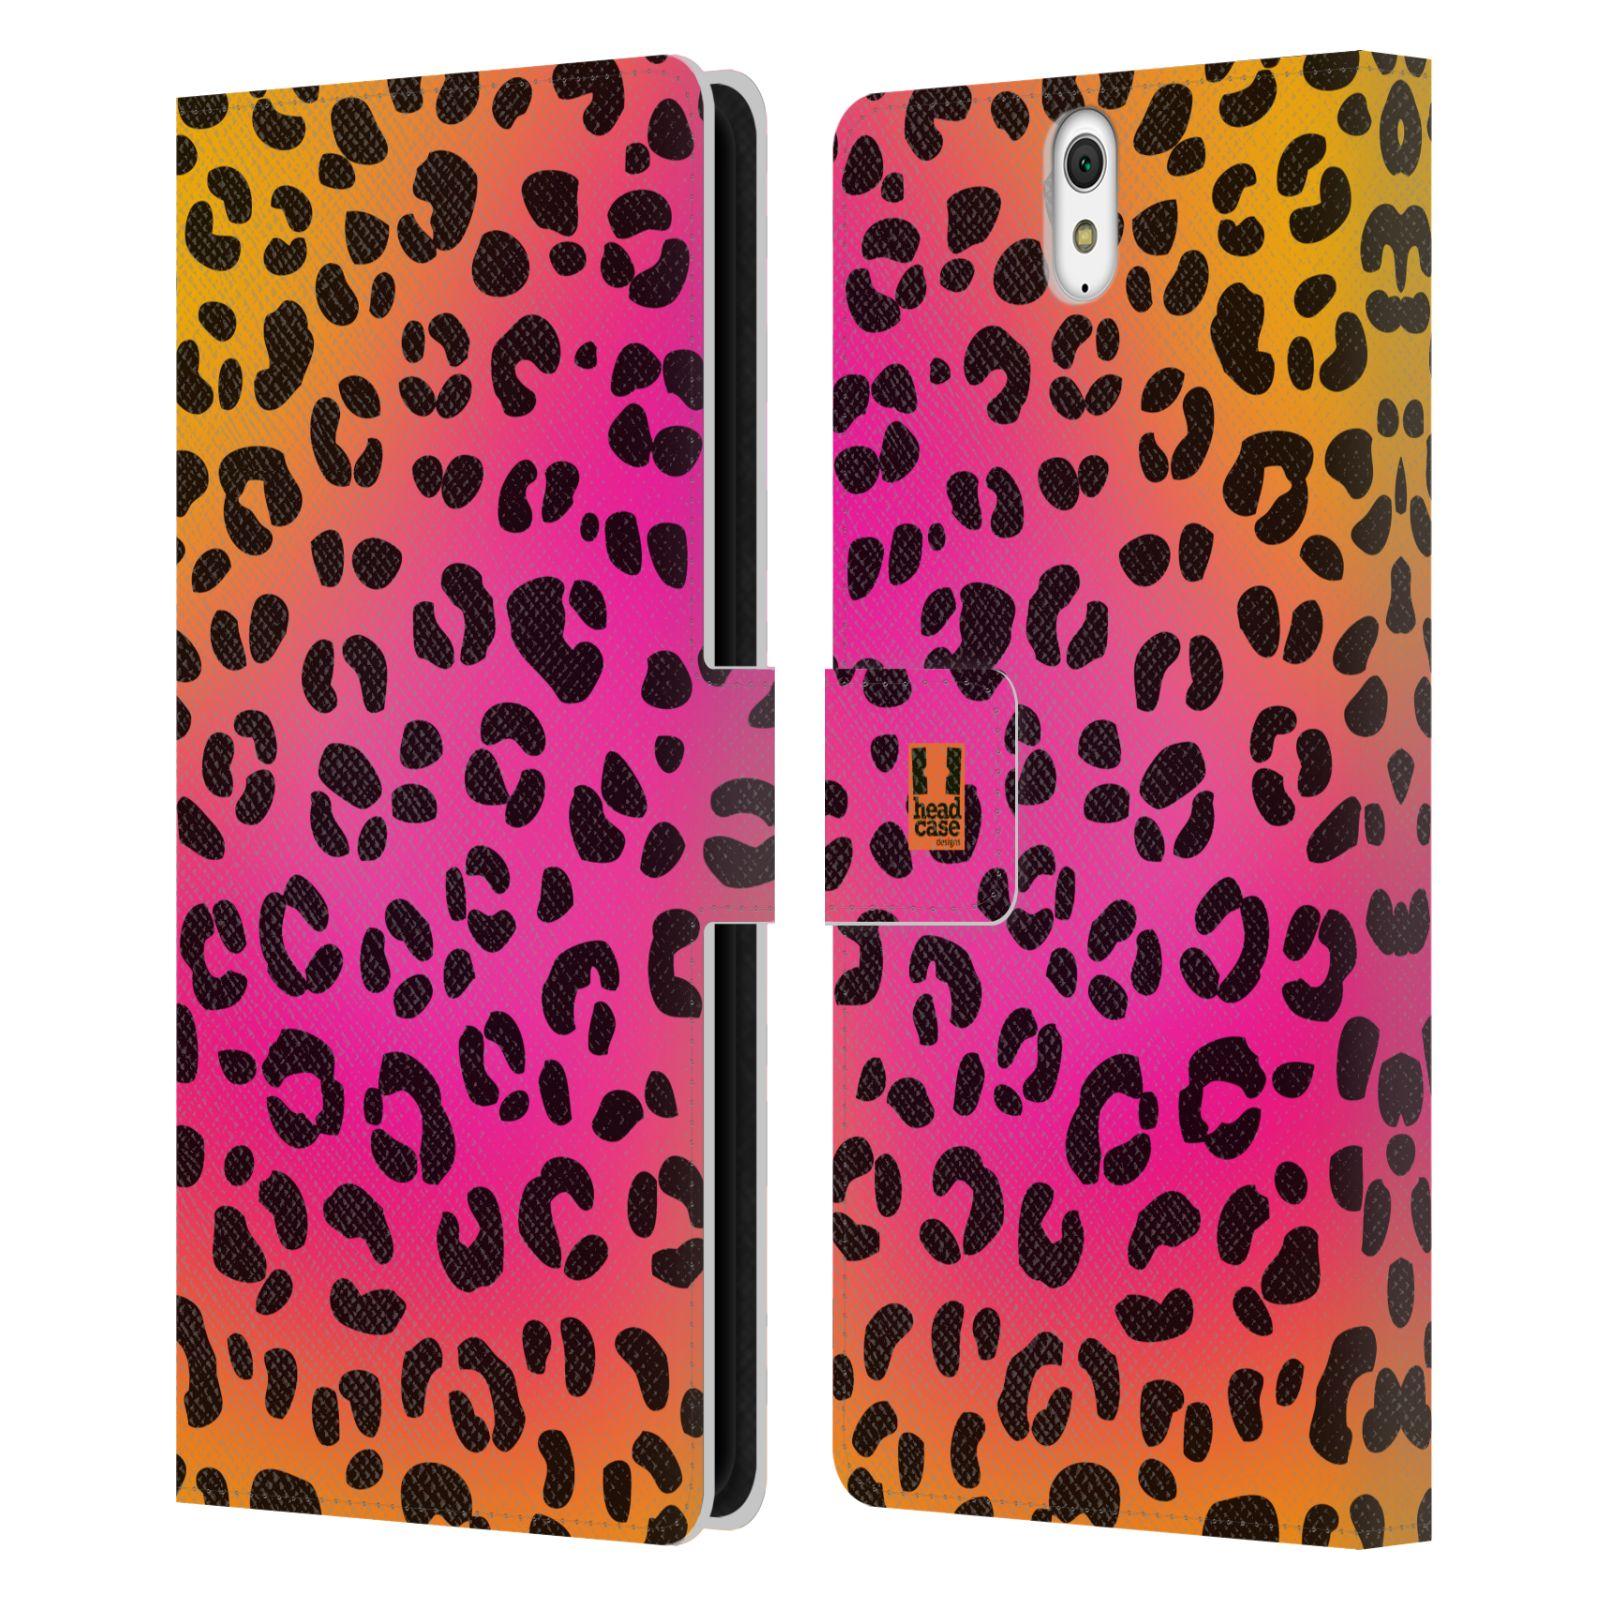 HEAD CASE Flipové pouzdro pro mobil SONY XPERIA C5 Ultra Zvířecí barevné vzory růžový leopard